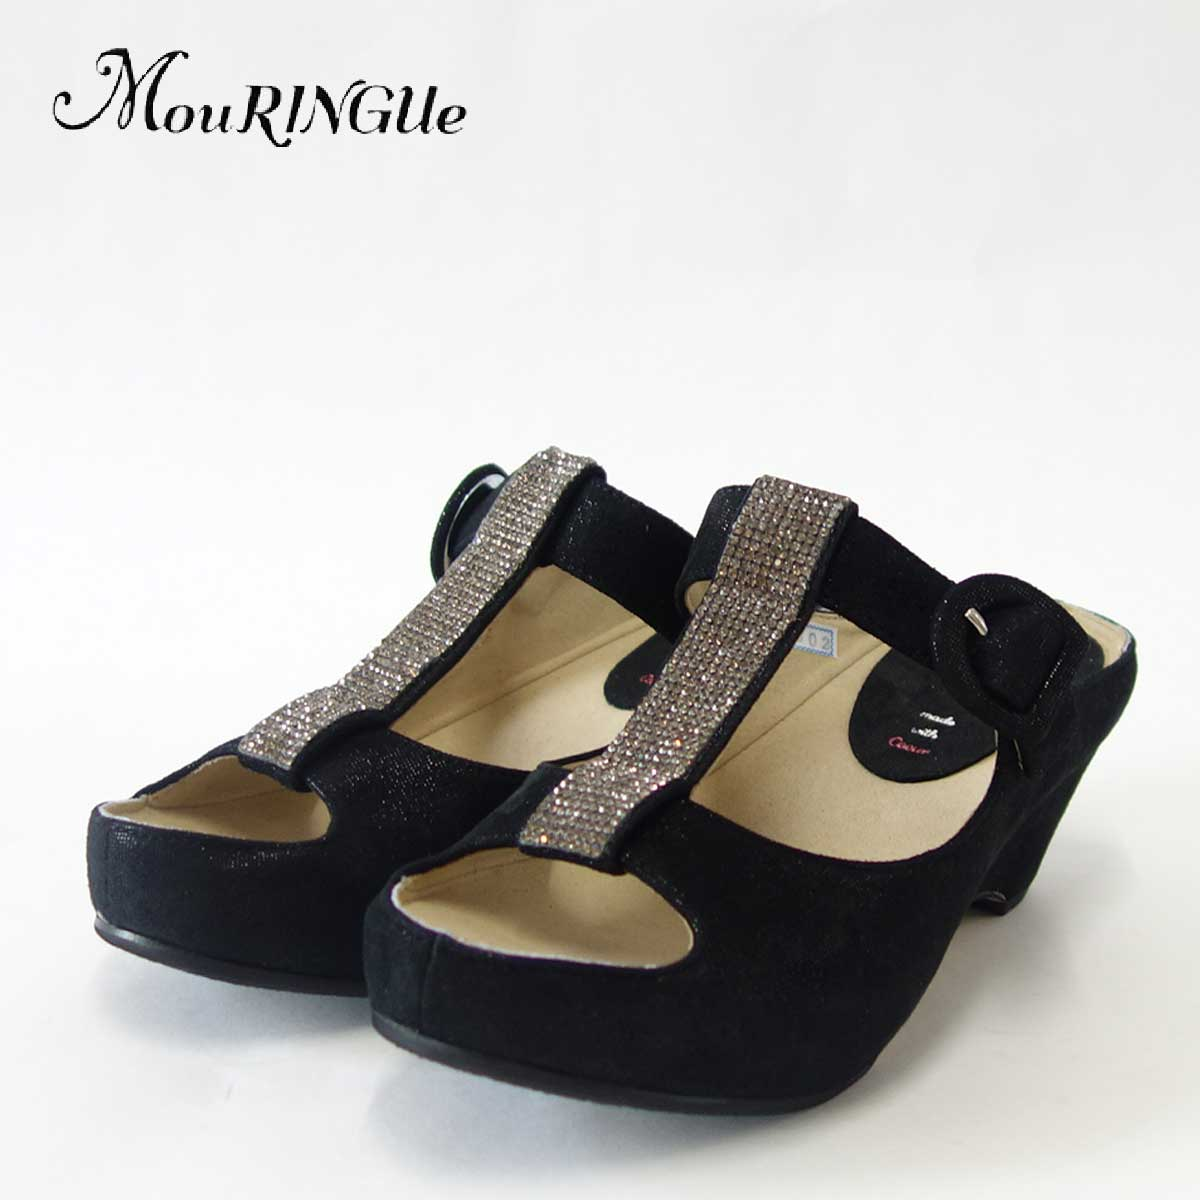 『MouRINGUe ムラング』Coeur568002 ブラック(日本製)快適クッションミュール「靴」